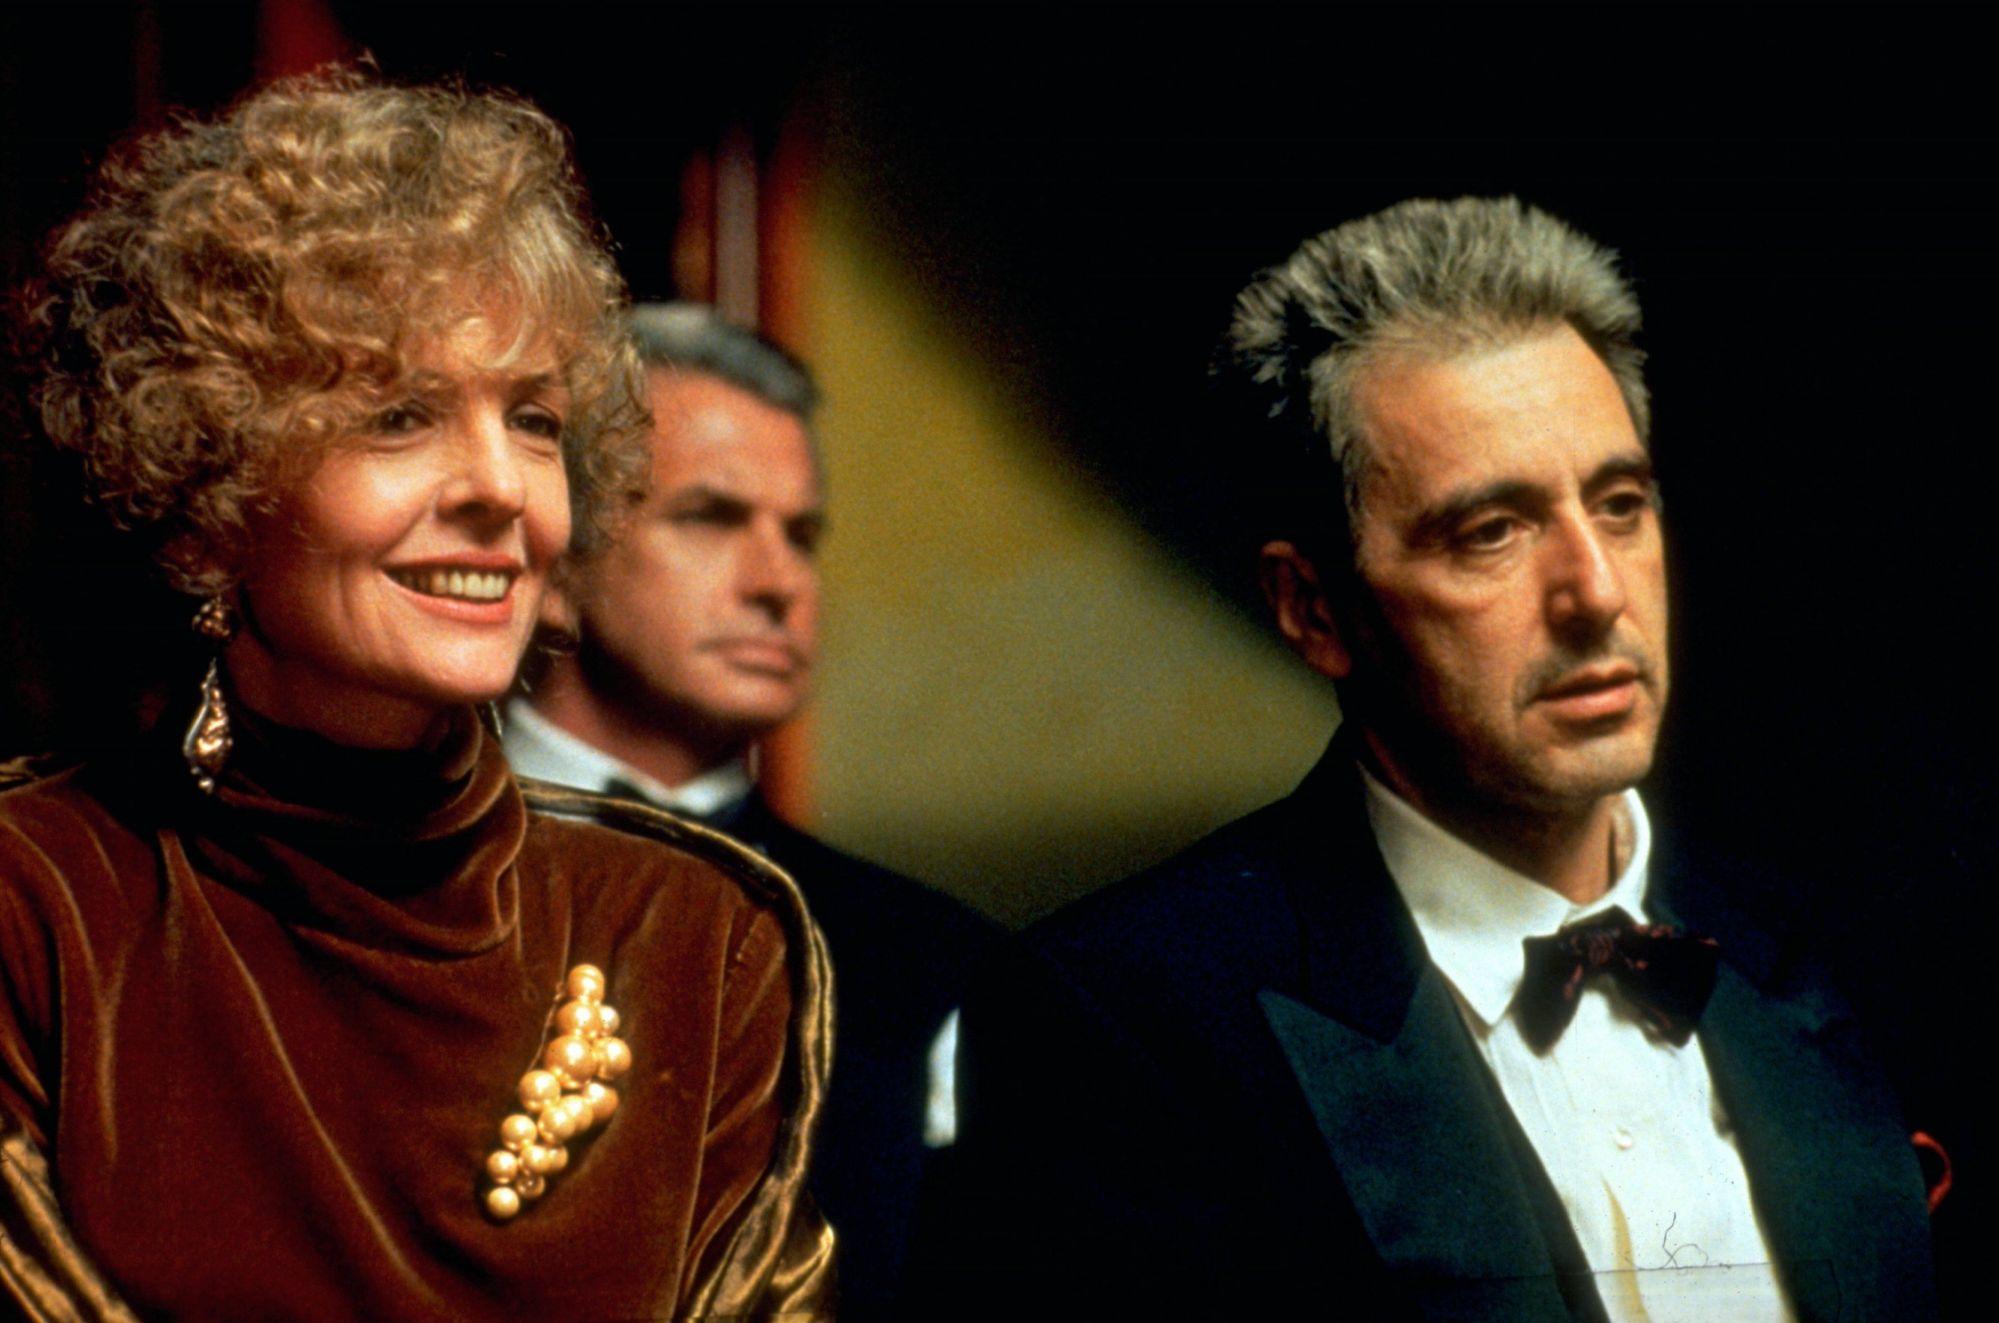 The Godfather III movie screenshot